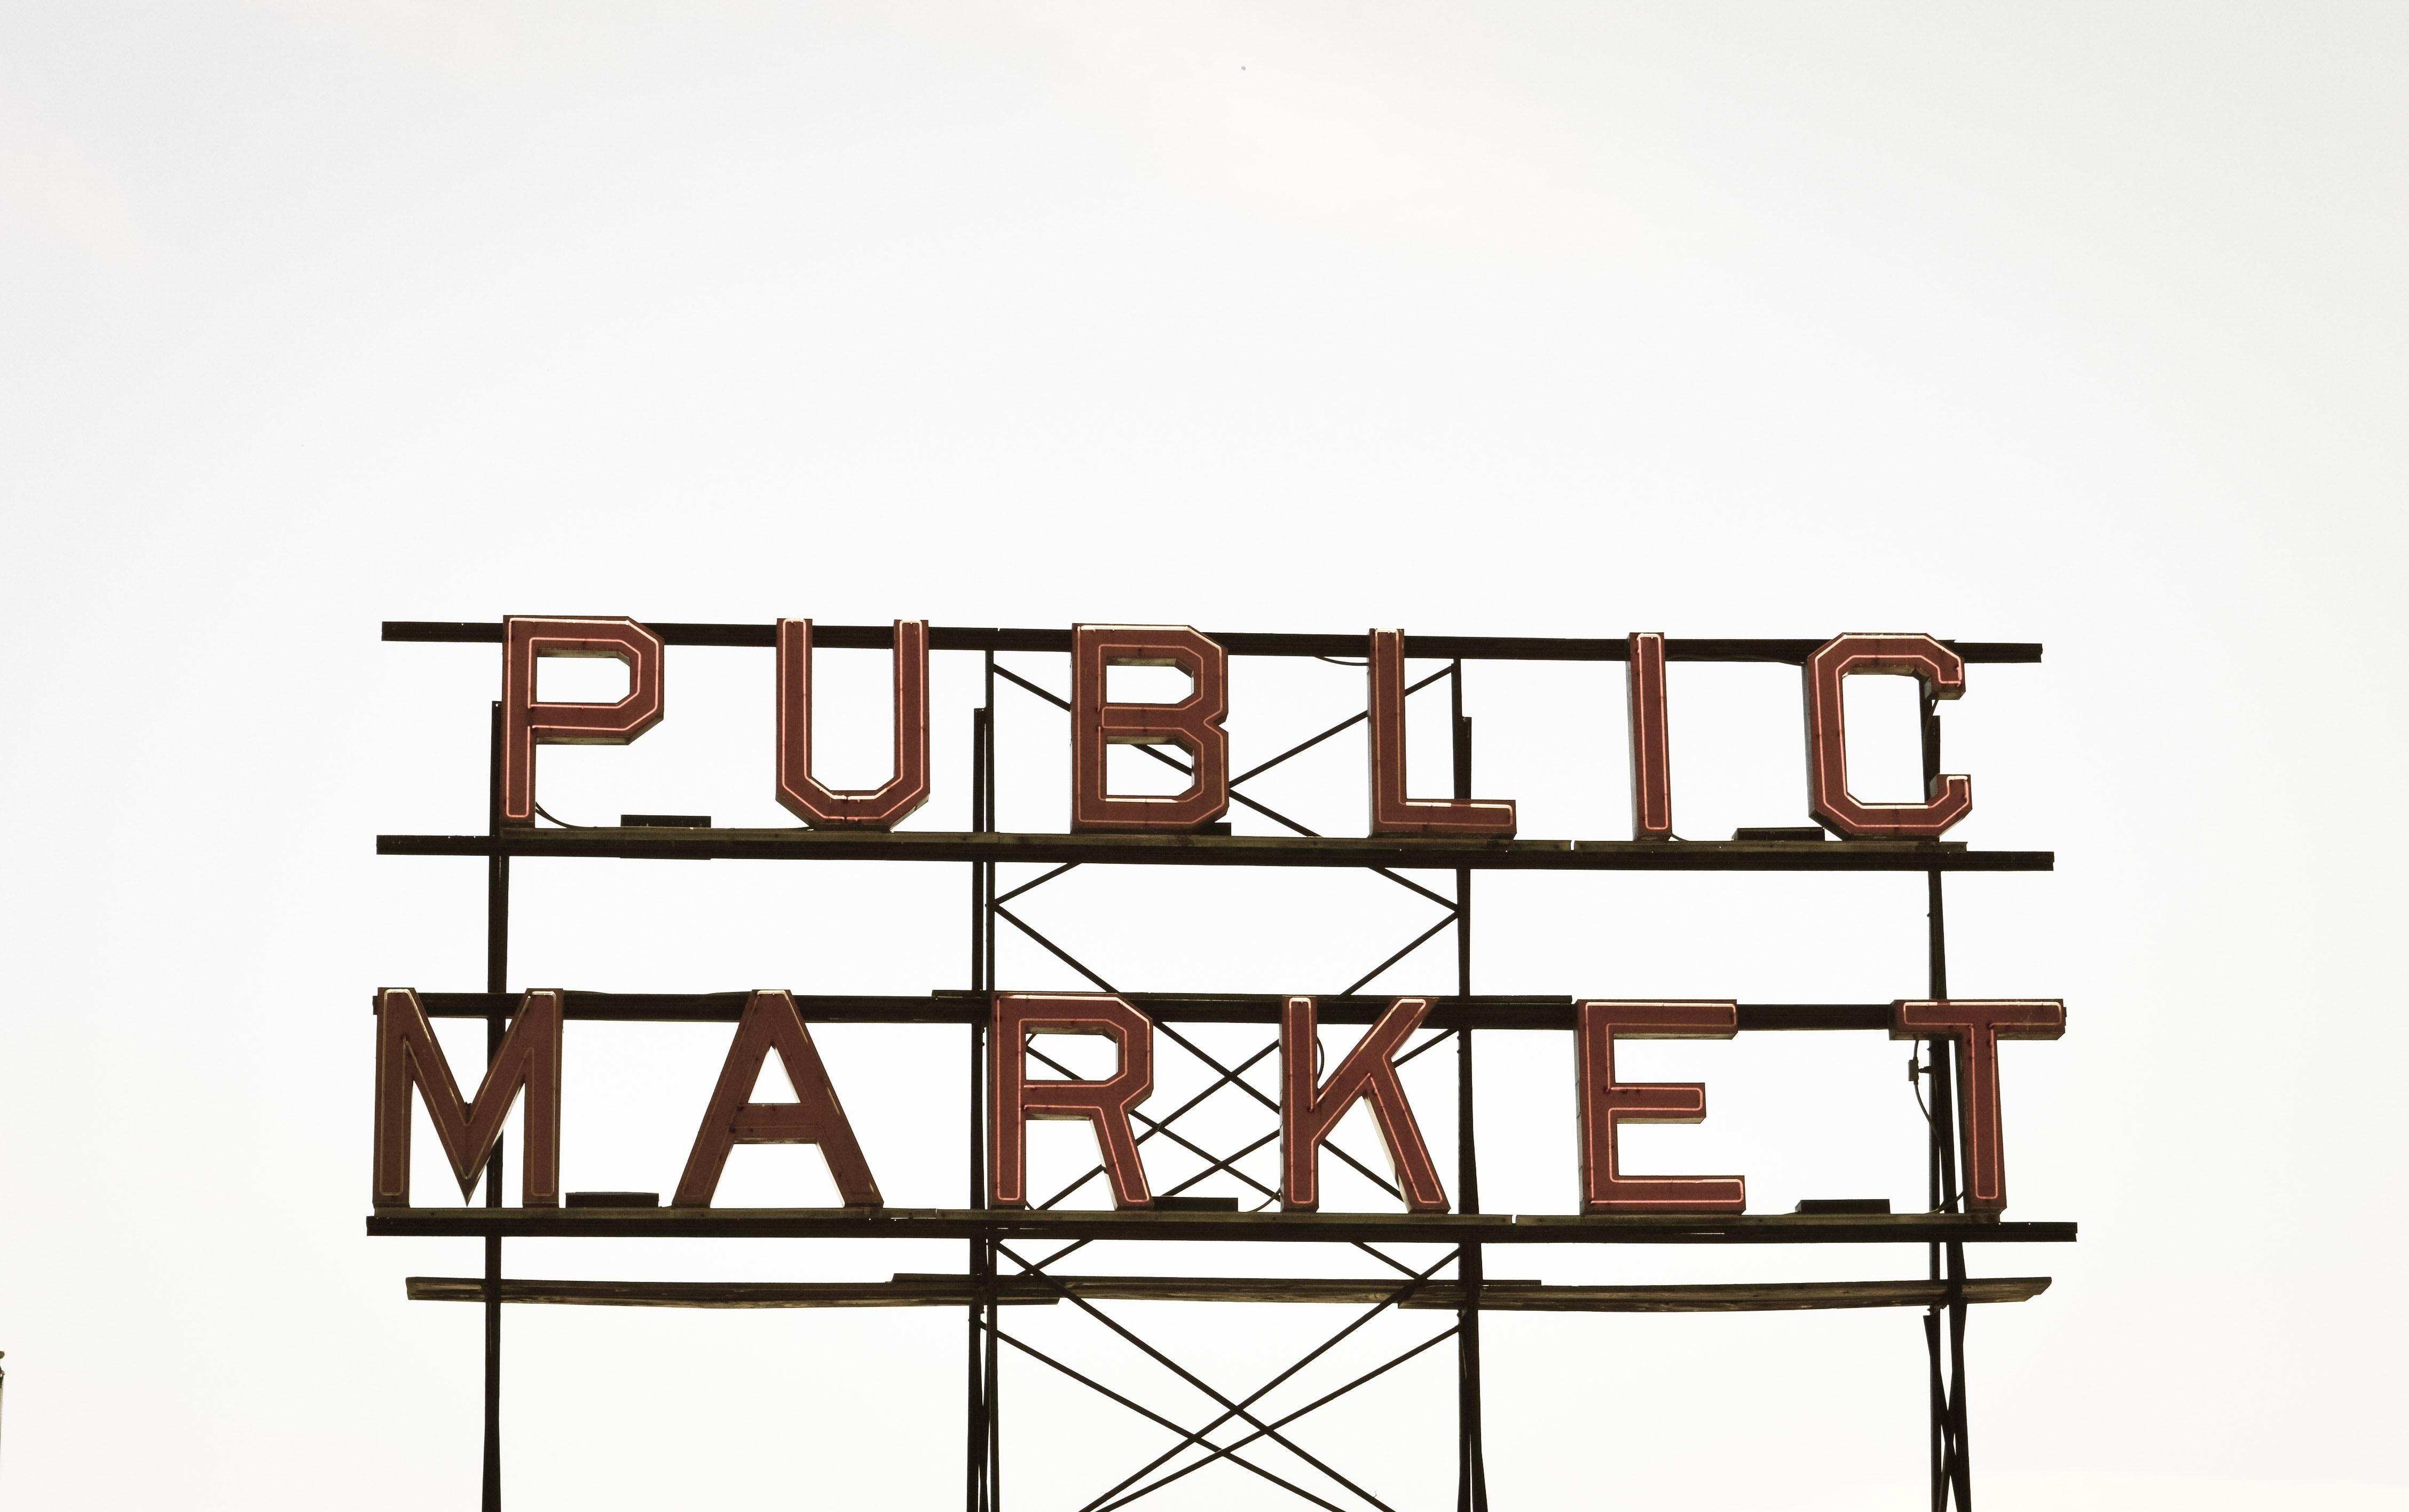 market lista de la compra simplementese coach nutricional murcia